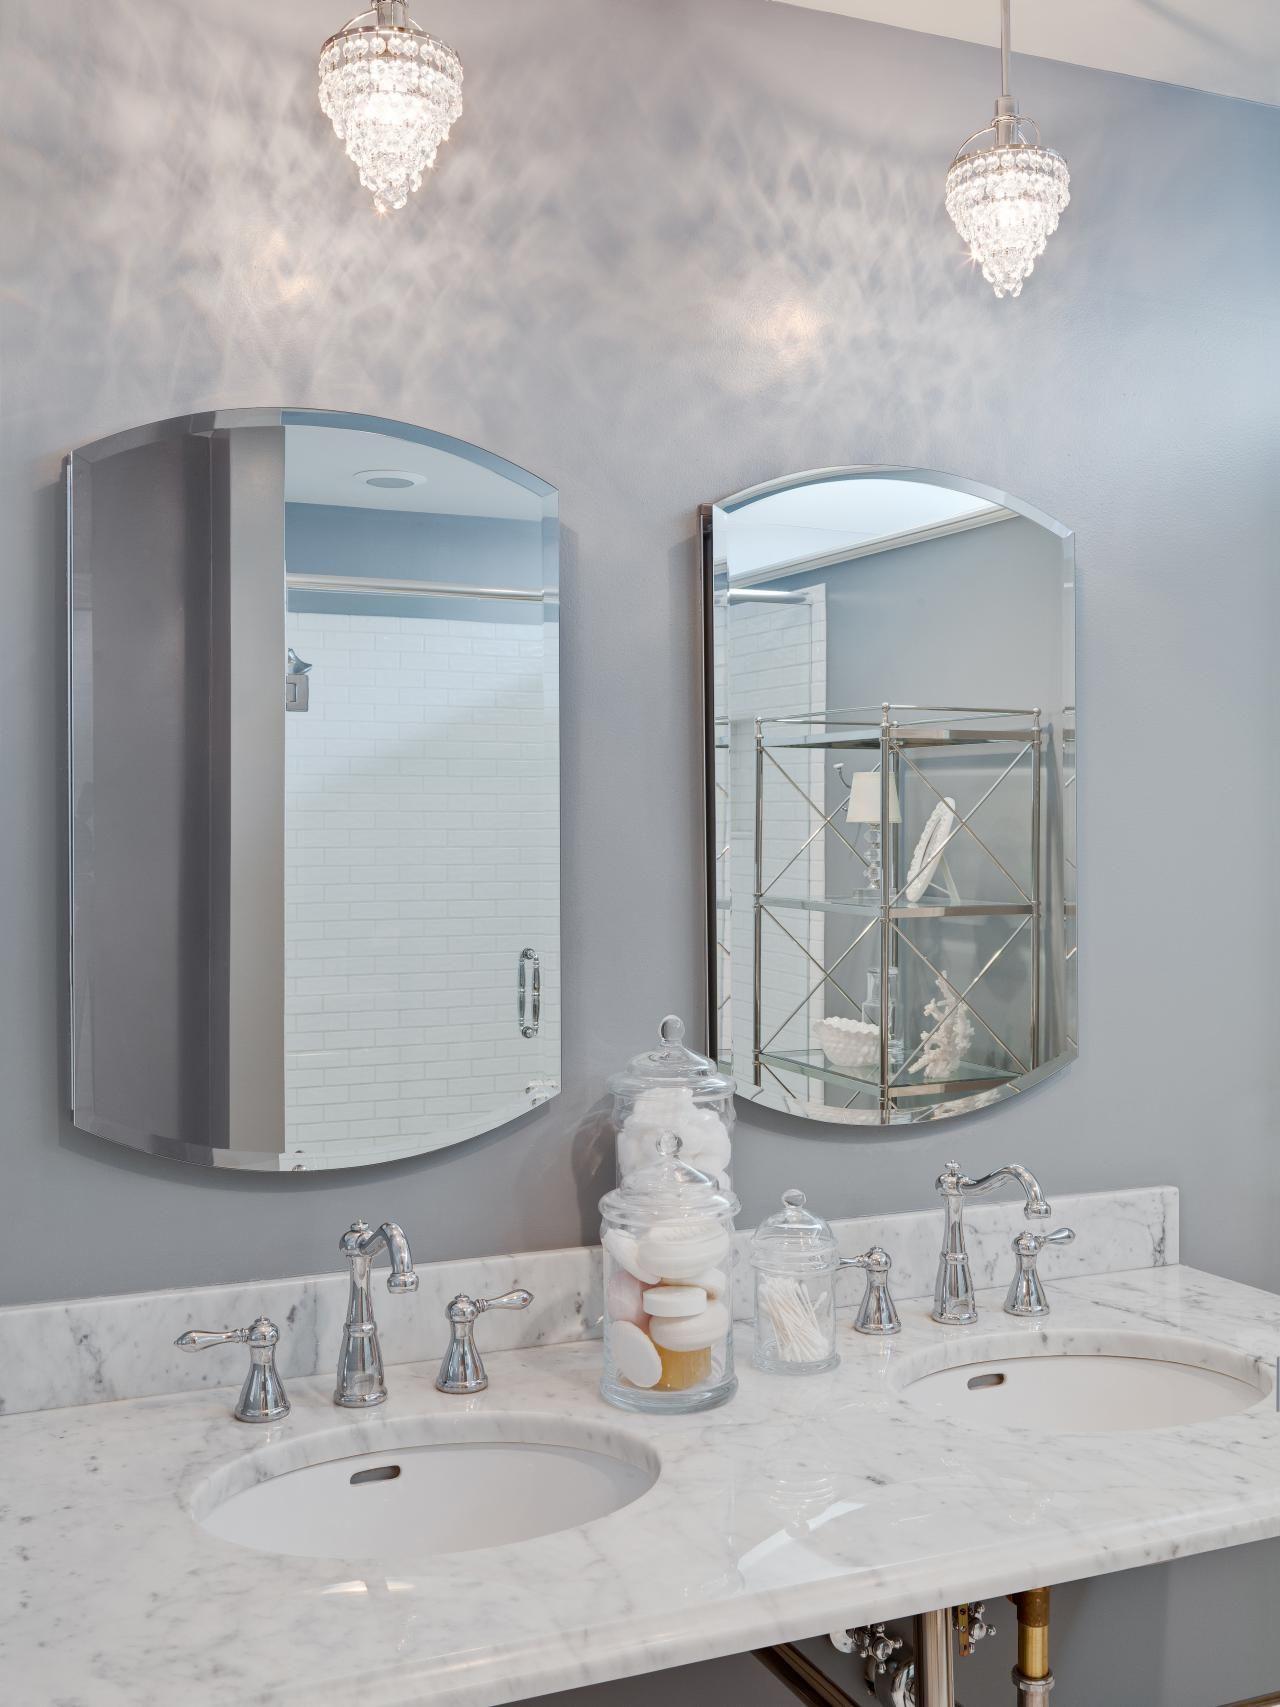 Double Vanity Bathroom With Sparkling Mini Chandeliers Small Bathroom Chandelier Luxury Master Bathrooms Bathroom Chandelier